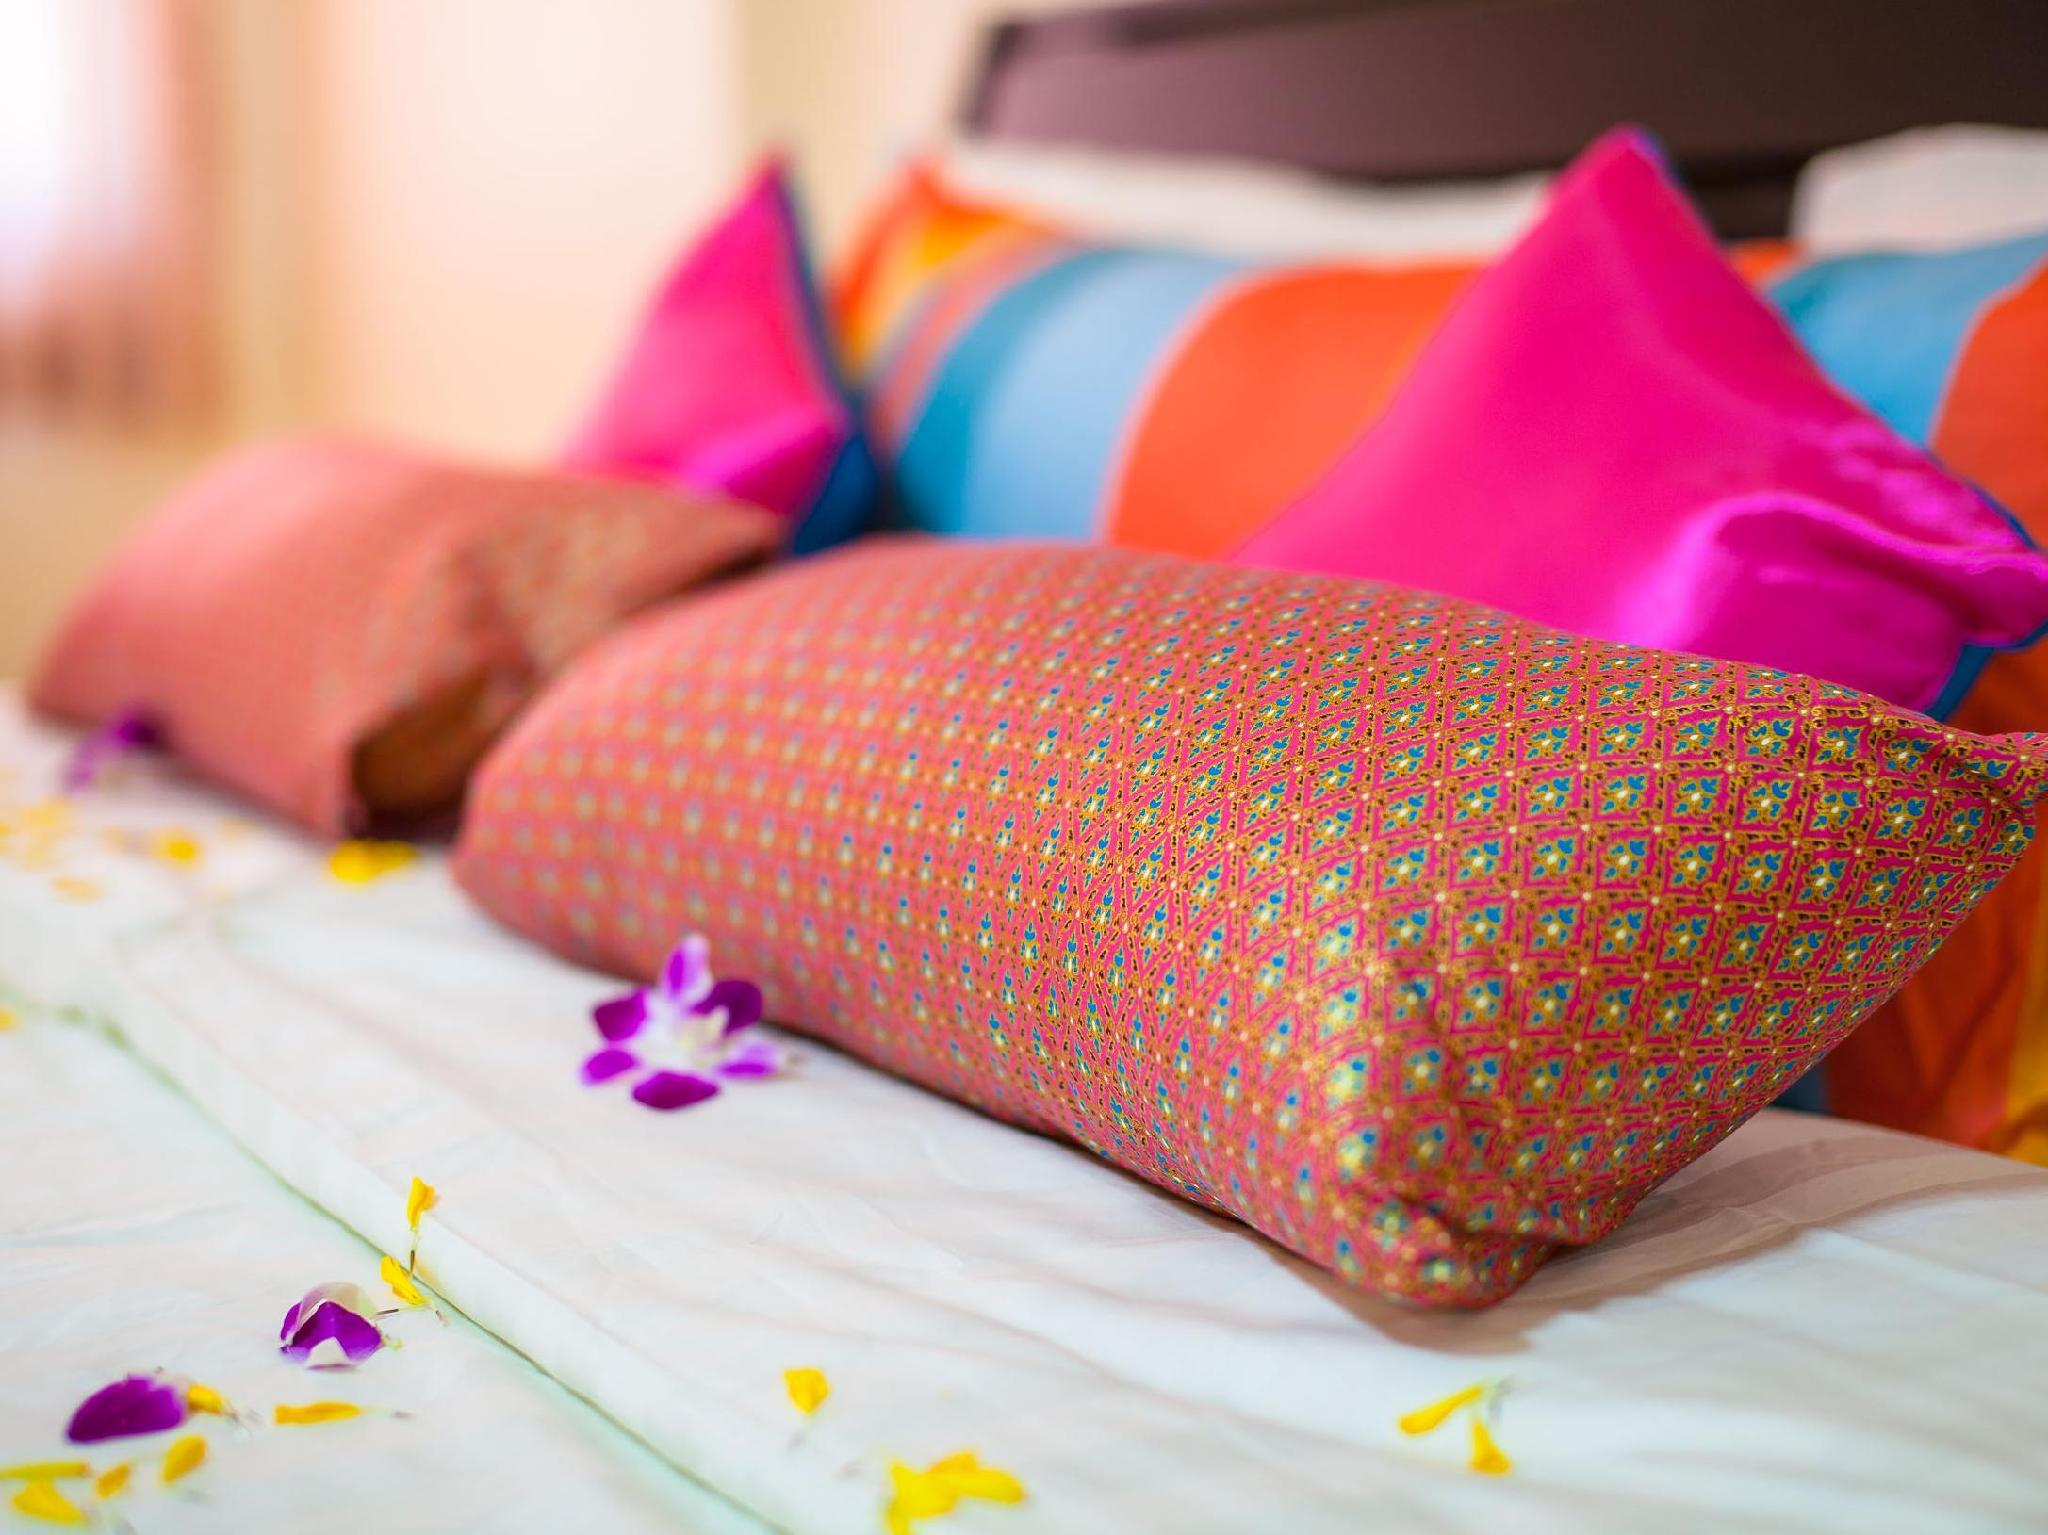 Jasmine House @ Pattaya - Pattaya